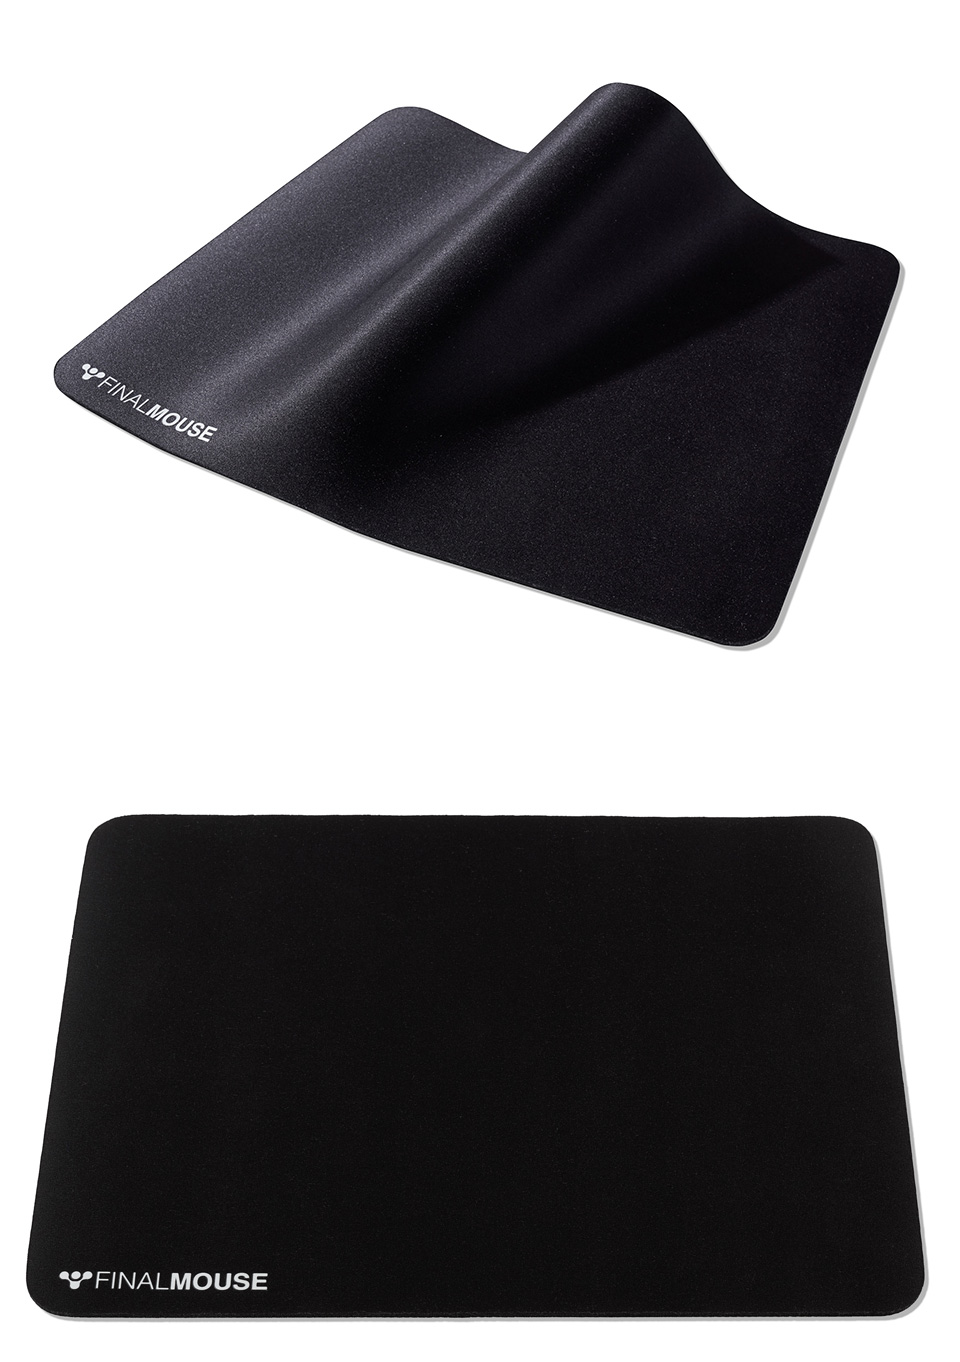 Finalmouse Surface Sport Mouse Pad [FM-SURFACE-SPORT] : PC